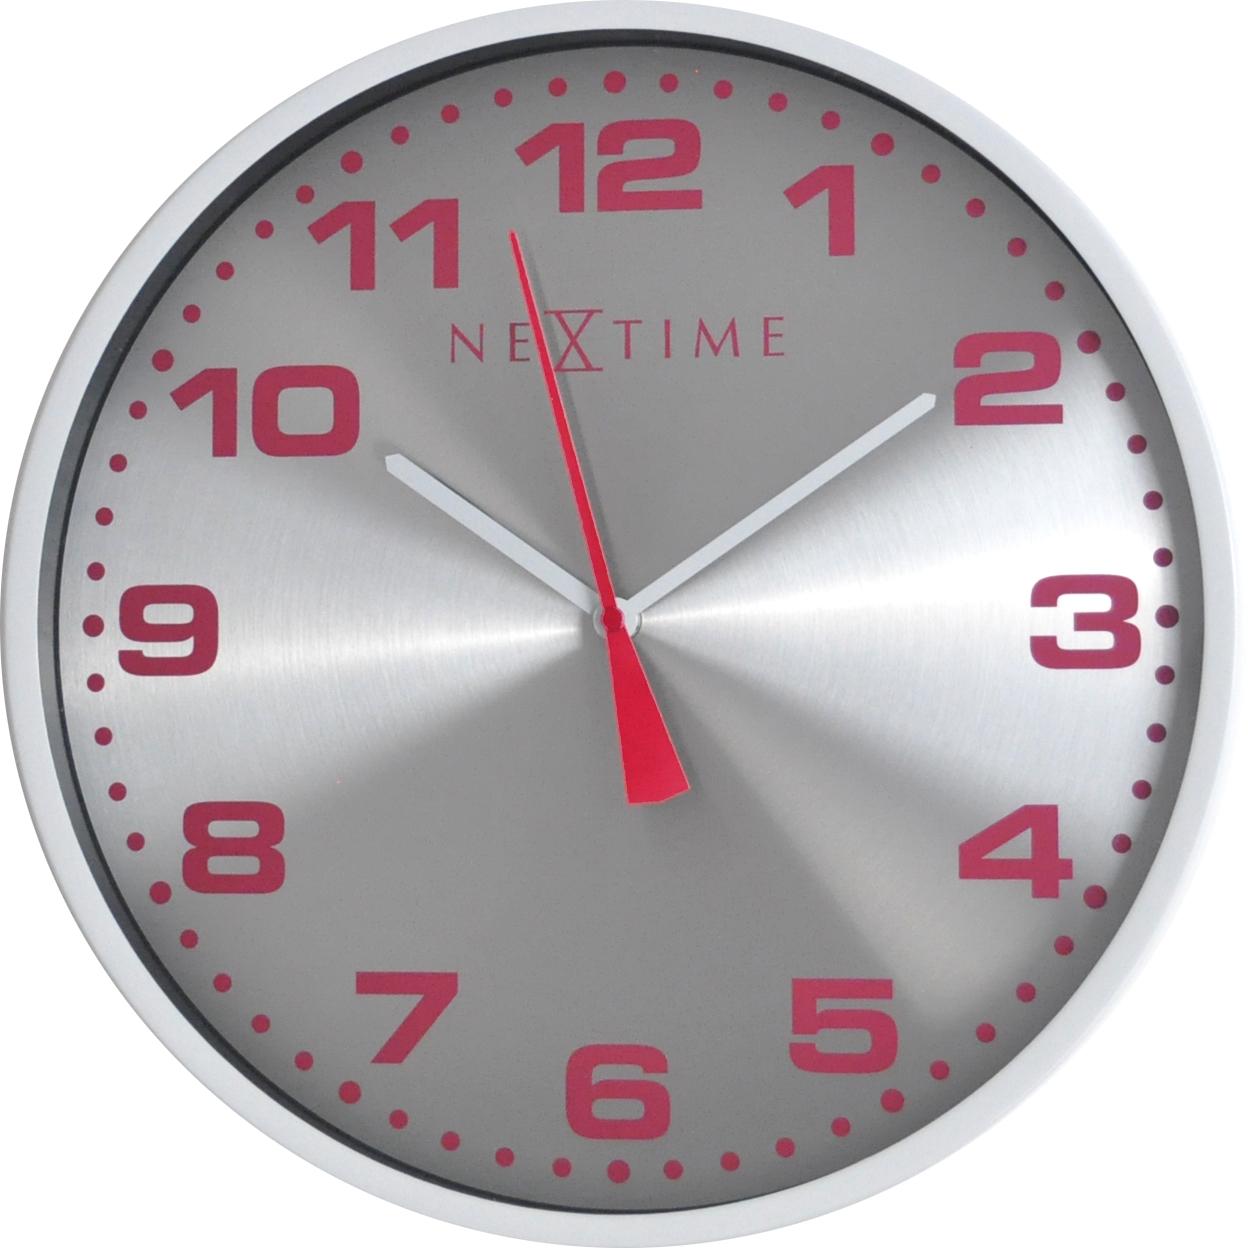 Nástěnné hodiny Dash White 35 cm - NEXTIME